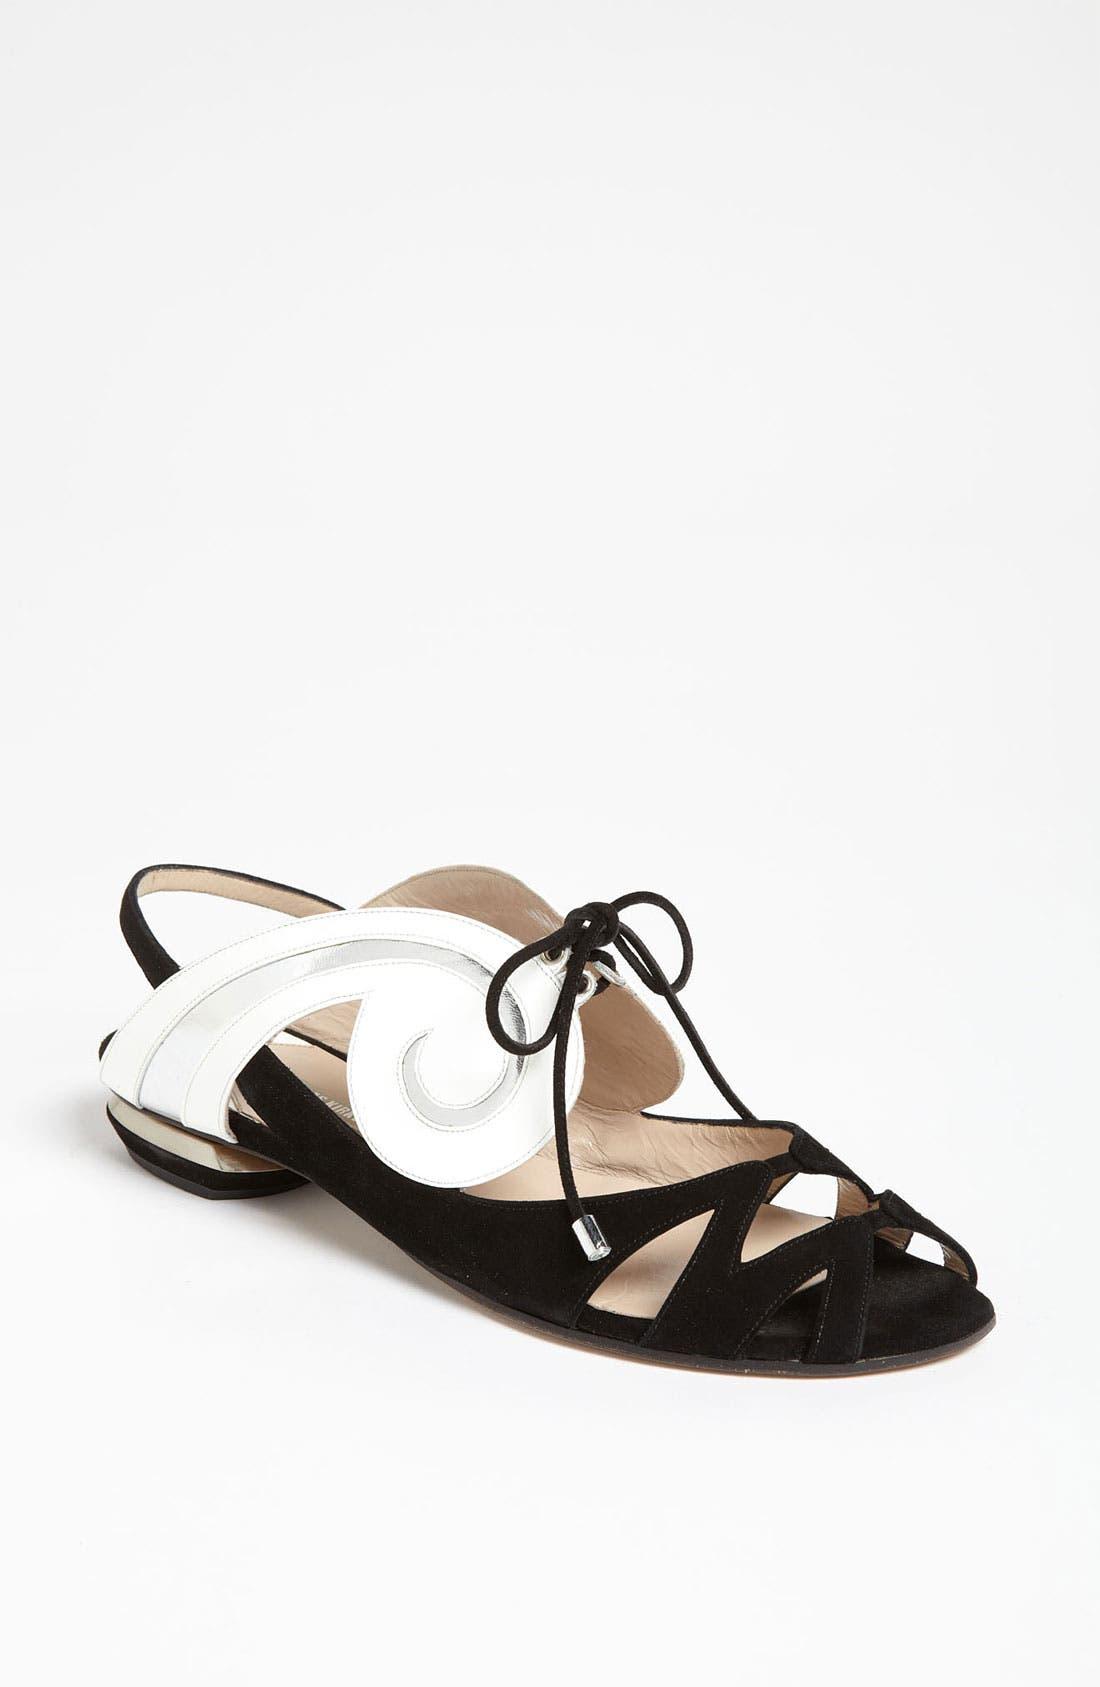 Alternate Image 1 Selected - Nicholas Kirkwood 'Swirl' Flat Sandal